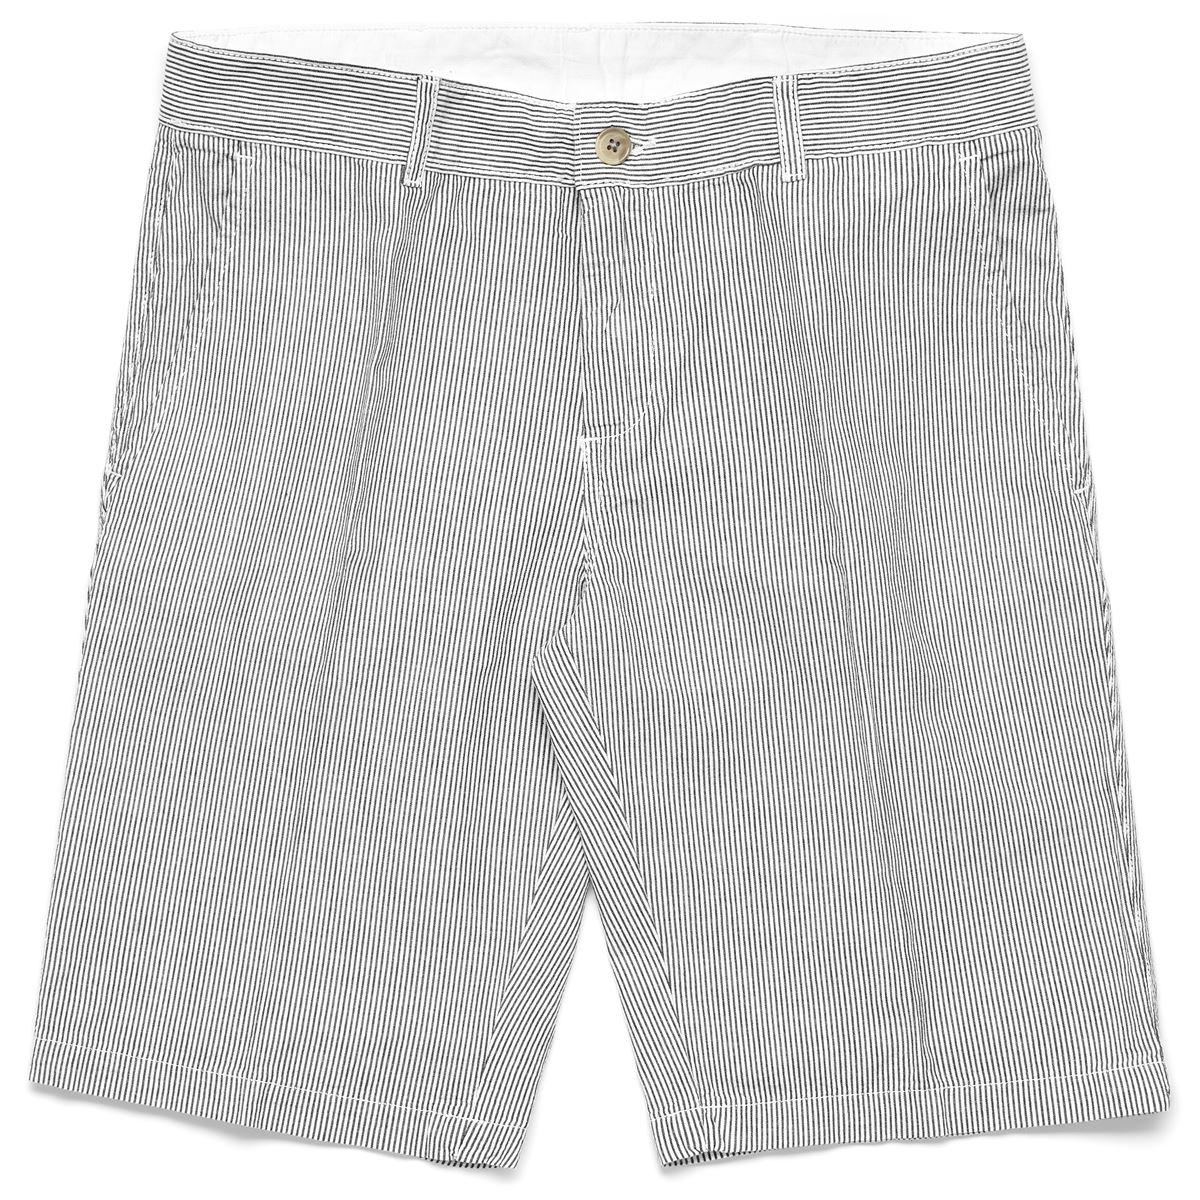 Robe di Kappa Pantaloncini uomo-661142W